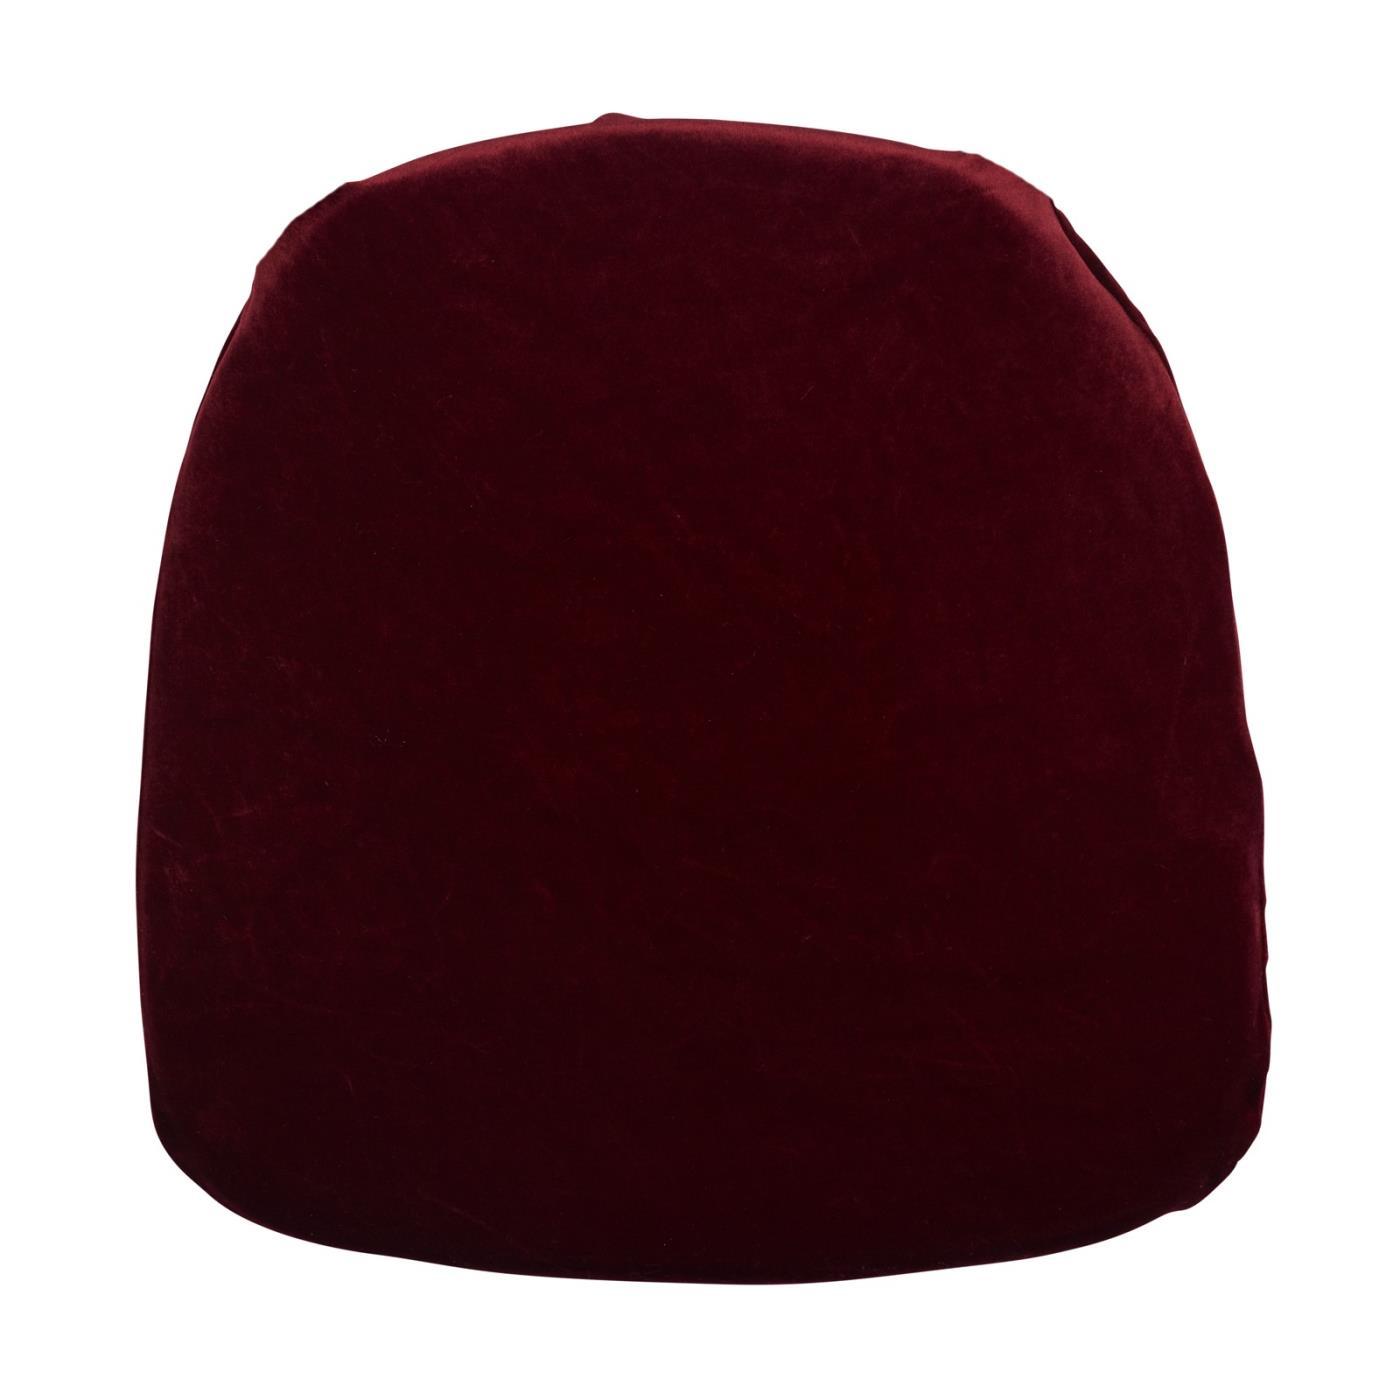 Velvet Seat Cushion - Burgundy